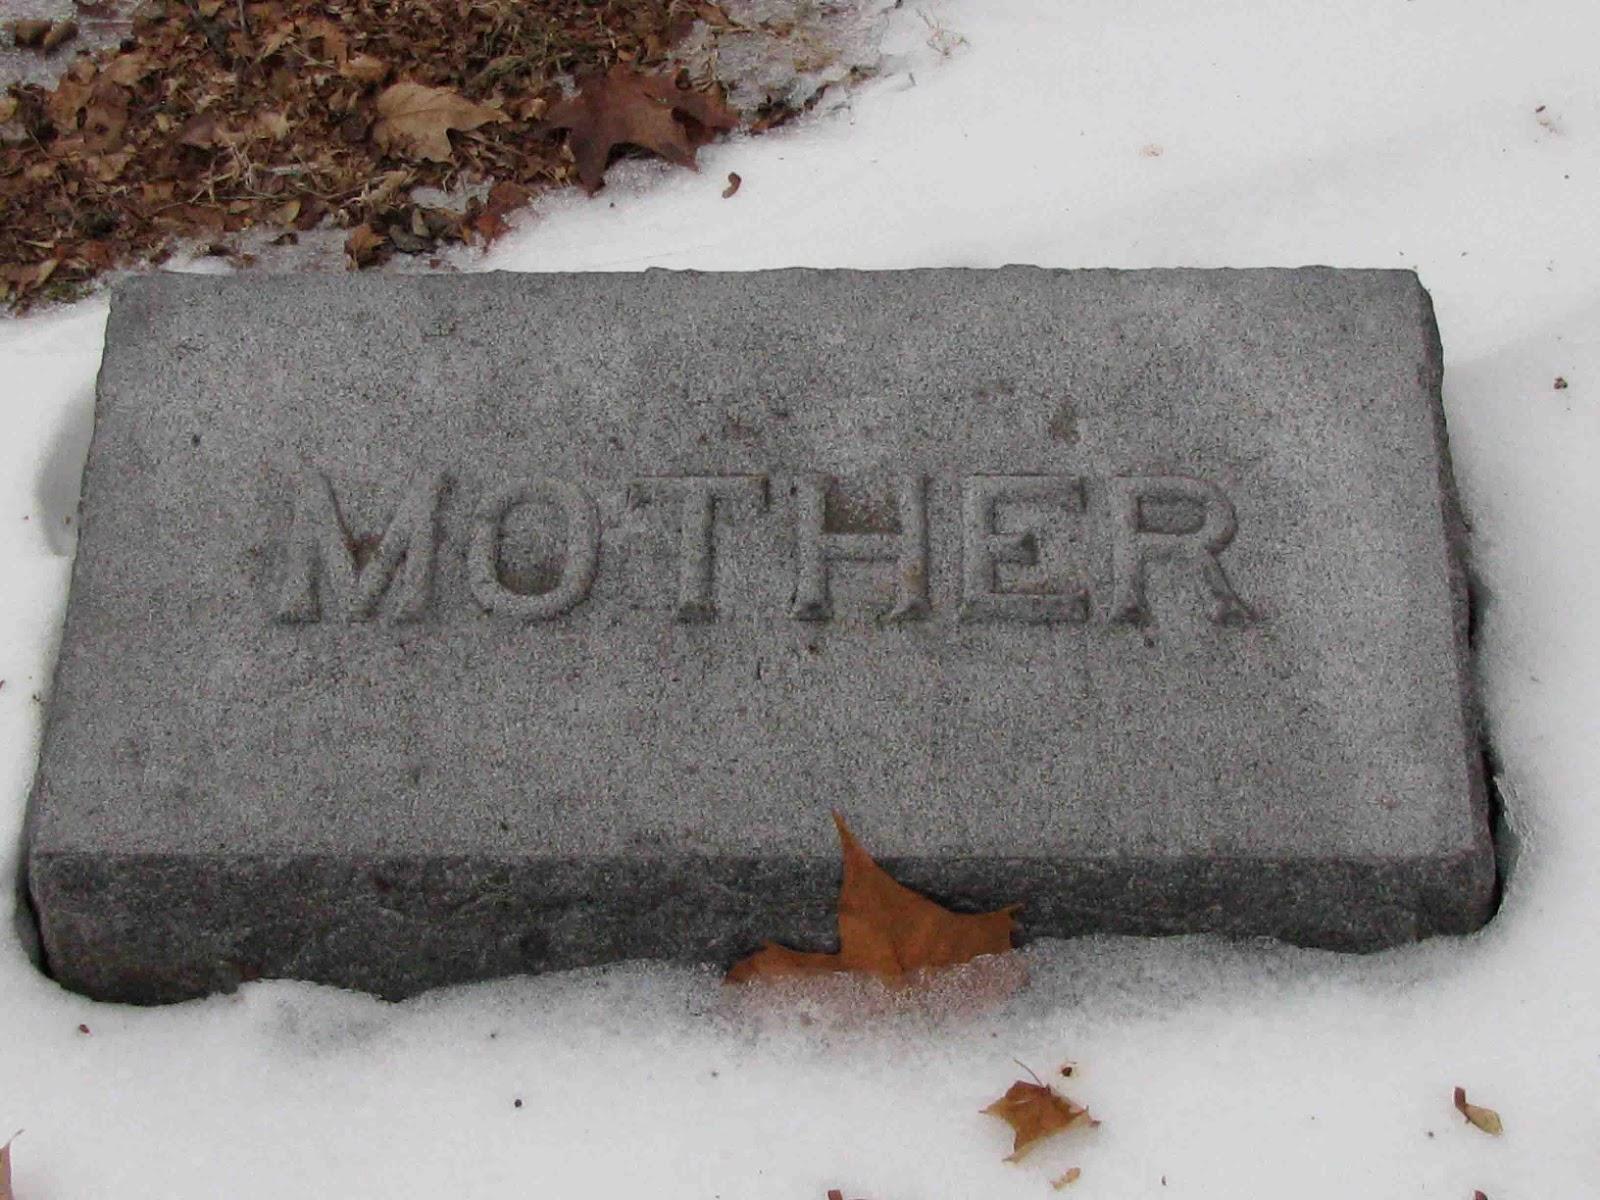 Detalles sobre las lápidas de madres